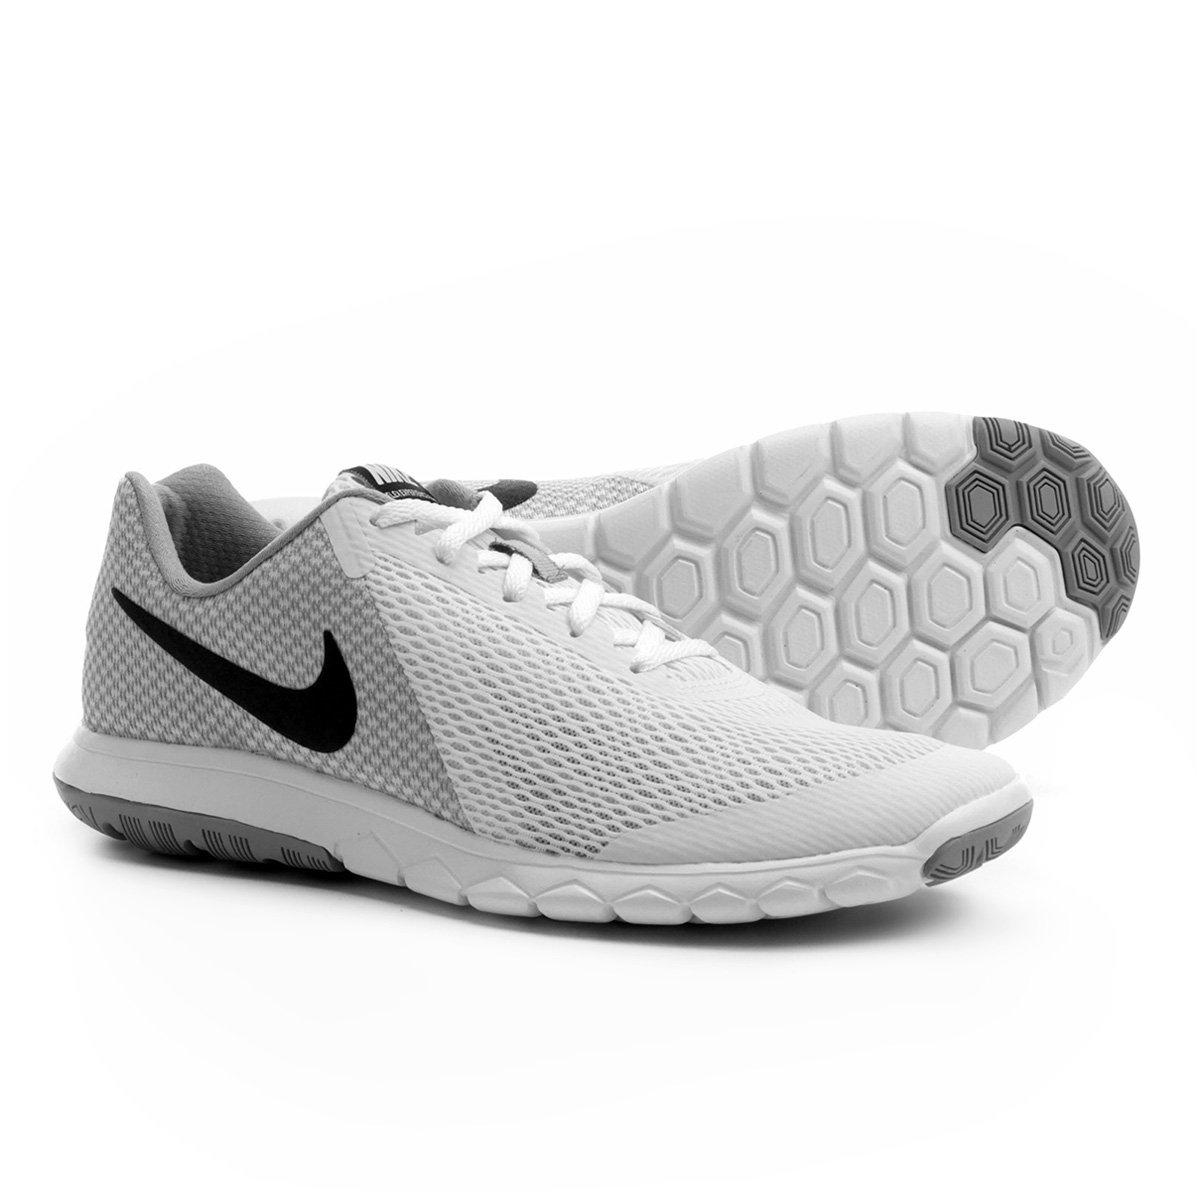 50355fe7b61 Tênis Nike Flex Experience Rn 6 Masculino - Branco e Cinza - Compre Agora